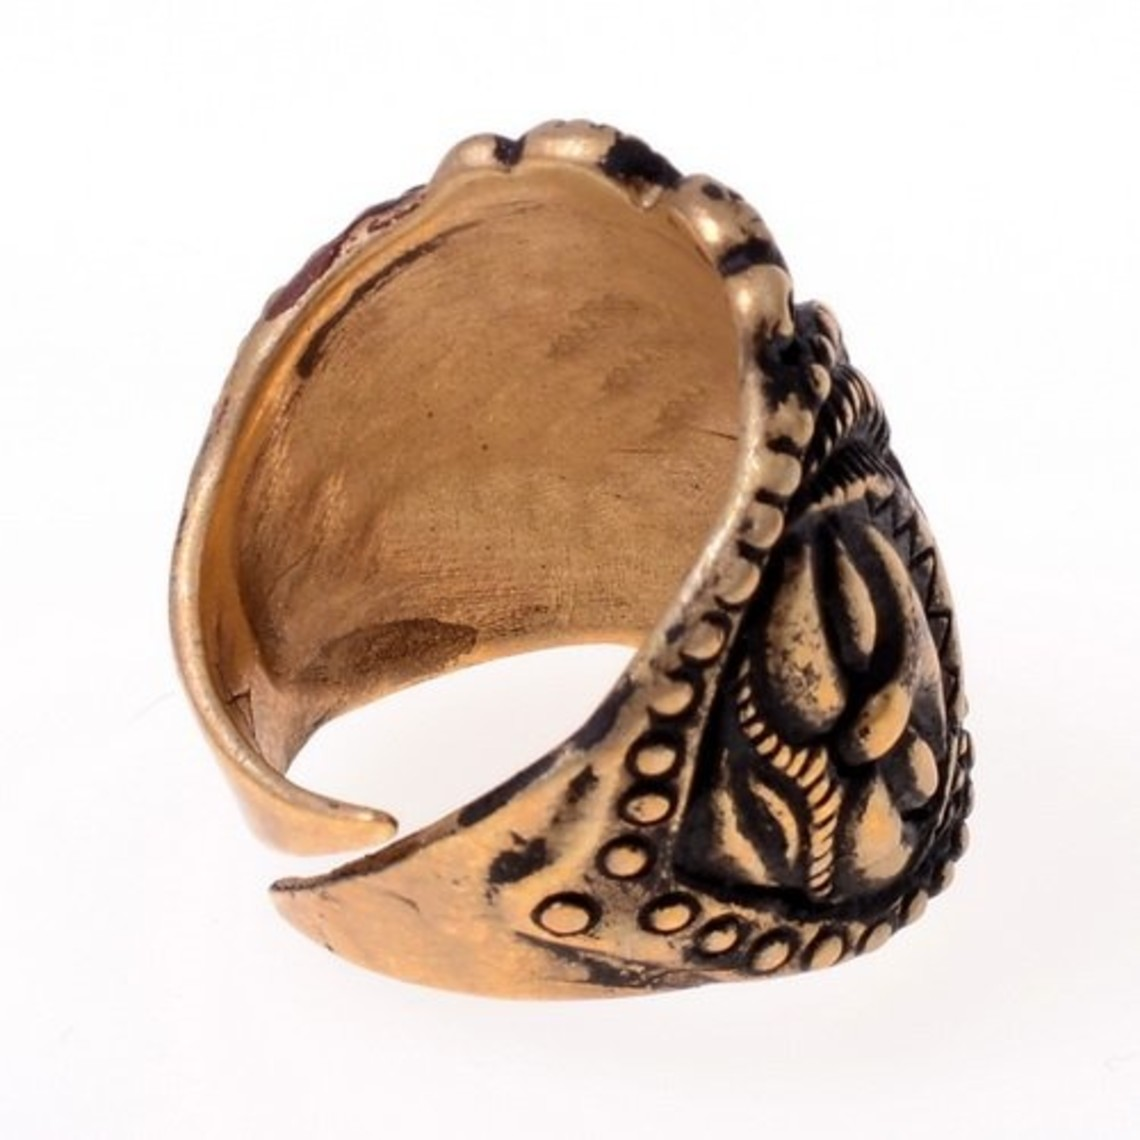 Celtic La Tene ring, bronze